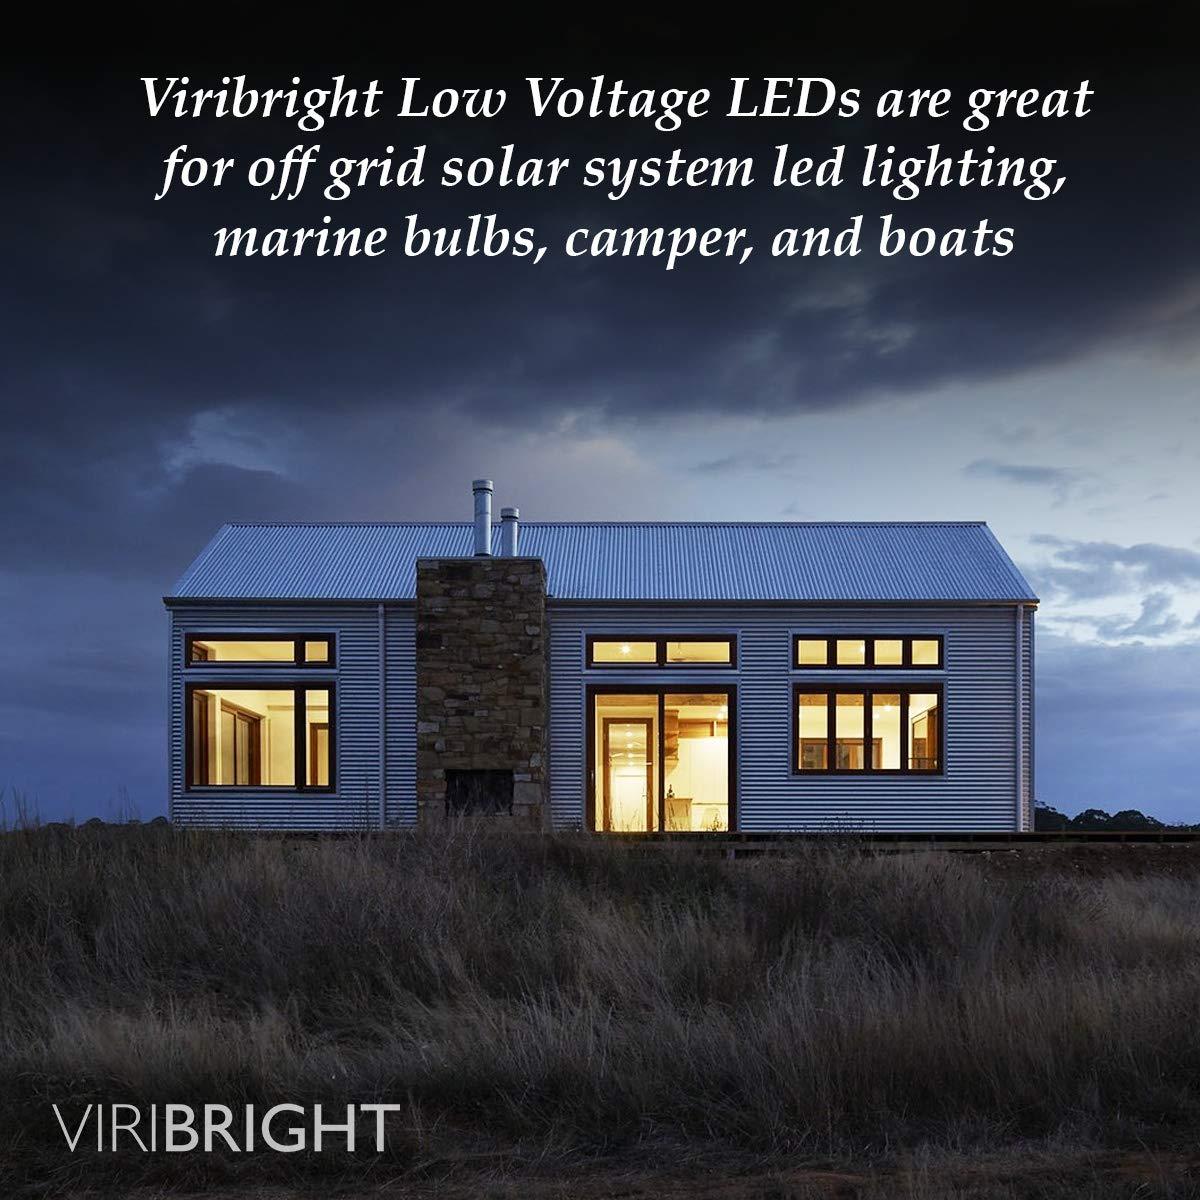 Viribright Lighting 751619-4 Low Voltage LED, Viribright 12-24V DC, (10W) 75 Watt Equivalent Light, 6000K Daylight, Edison Bulb Medium Base E26, ...